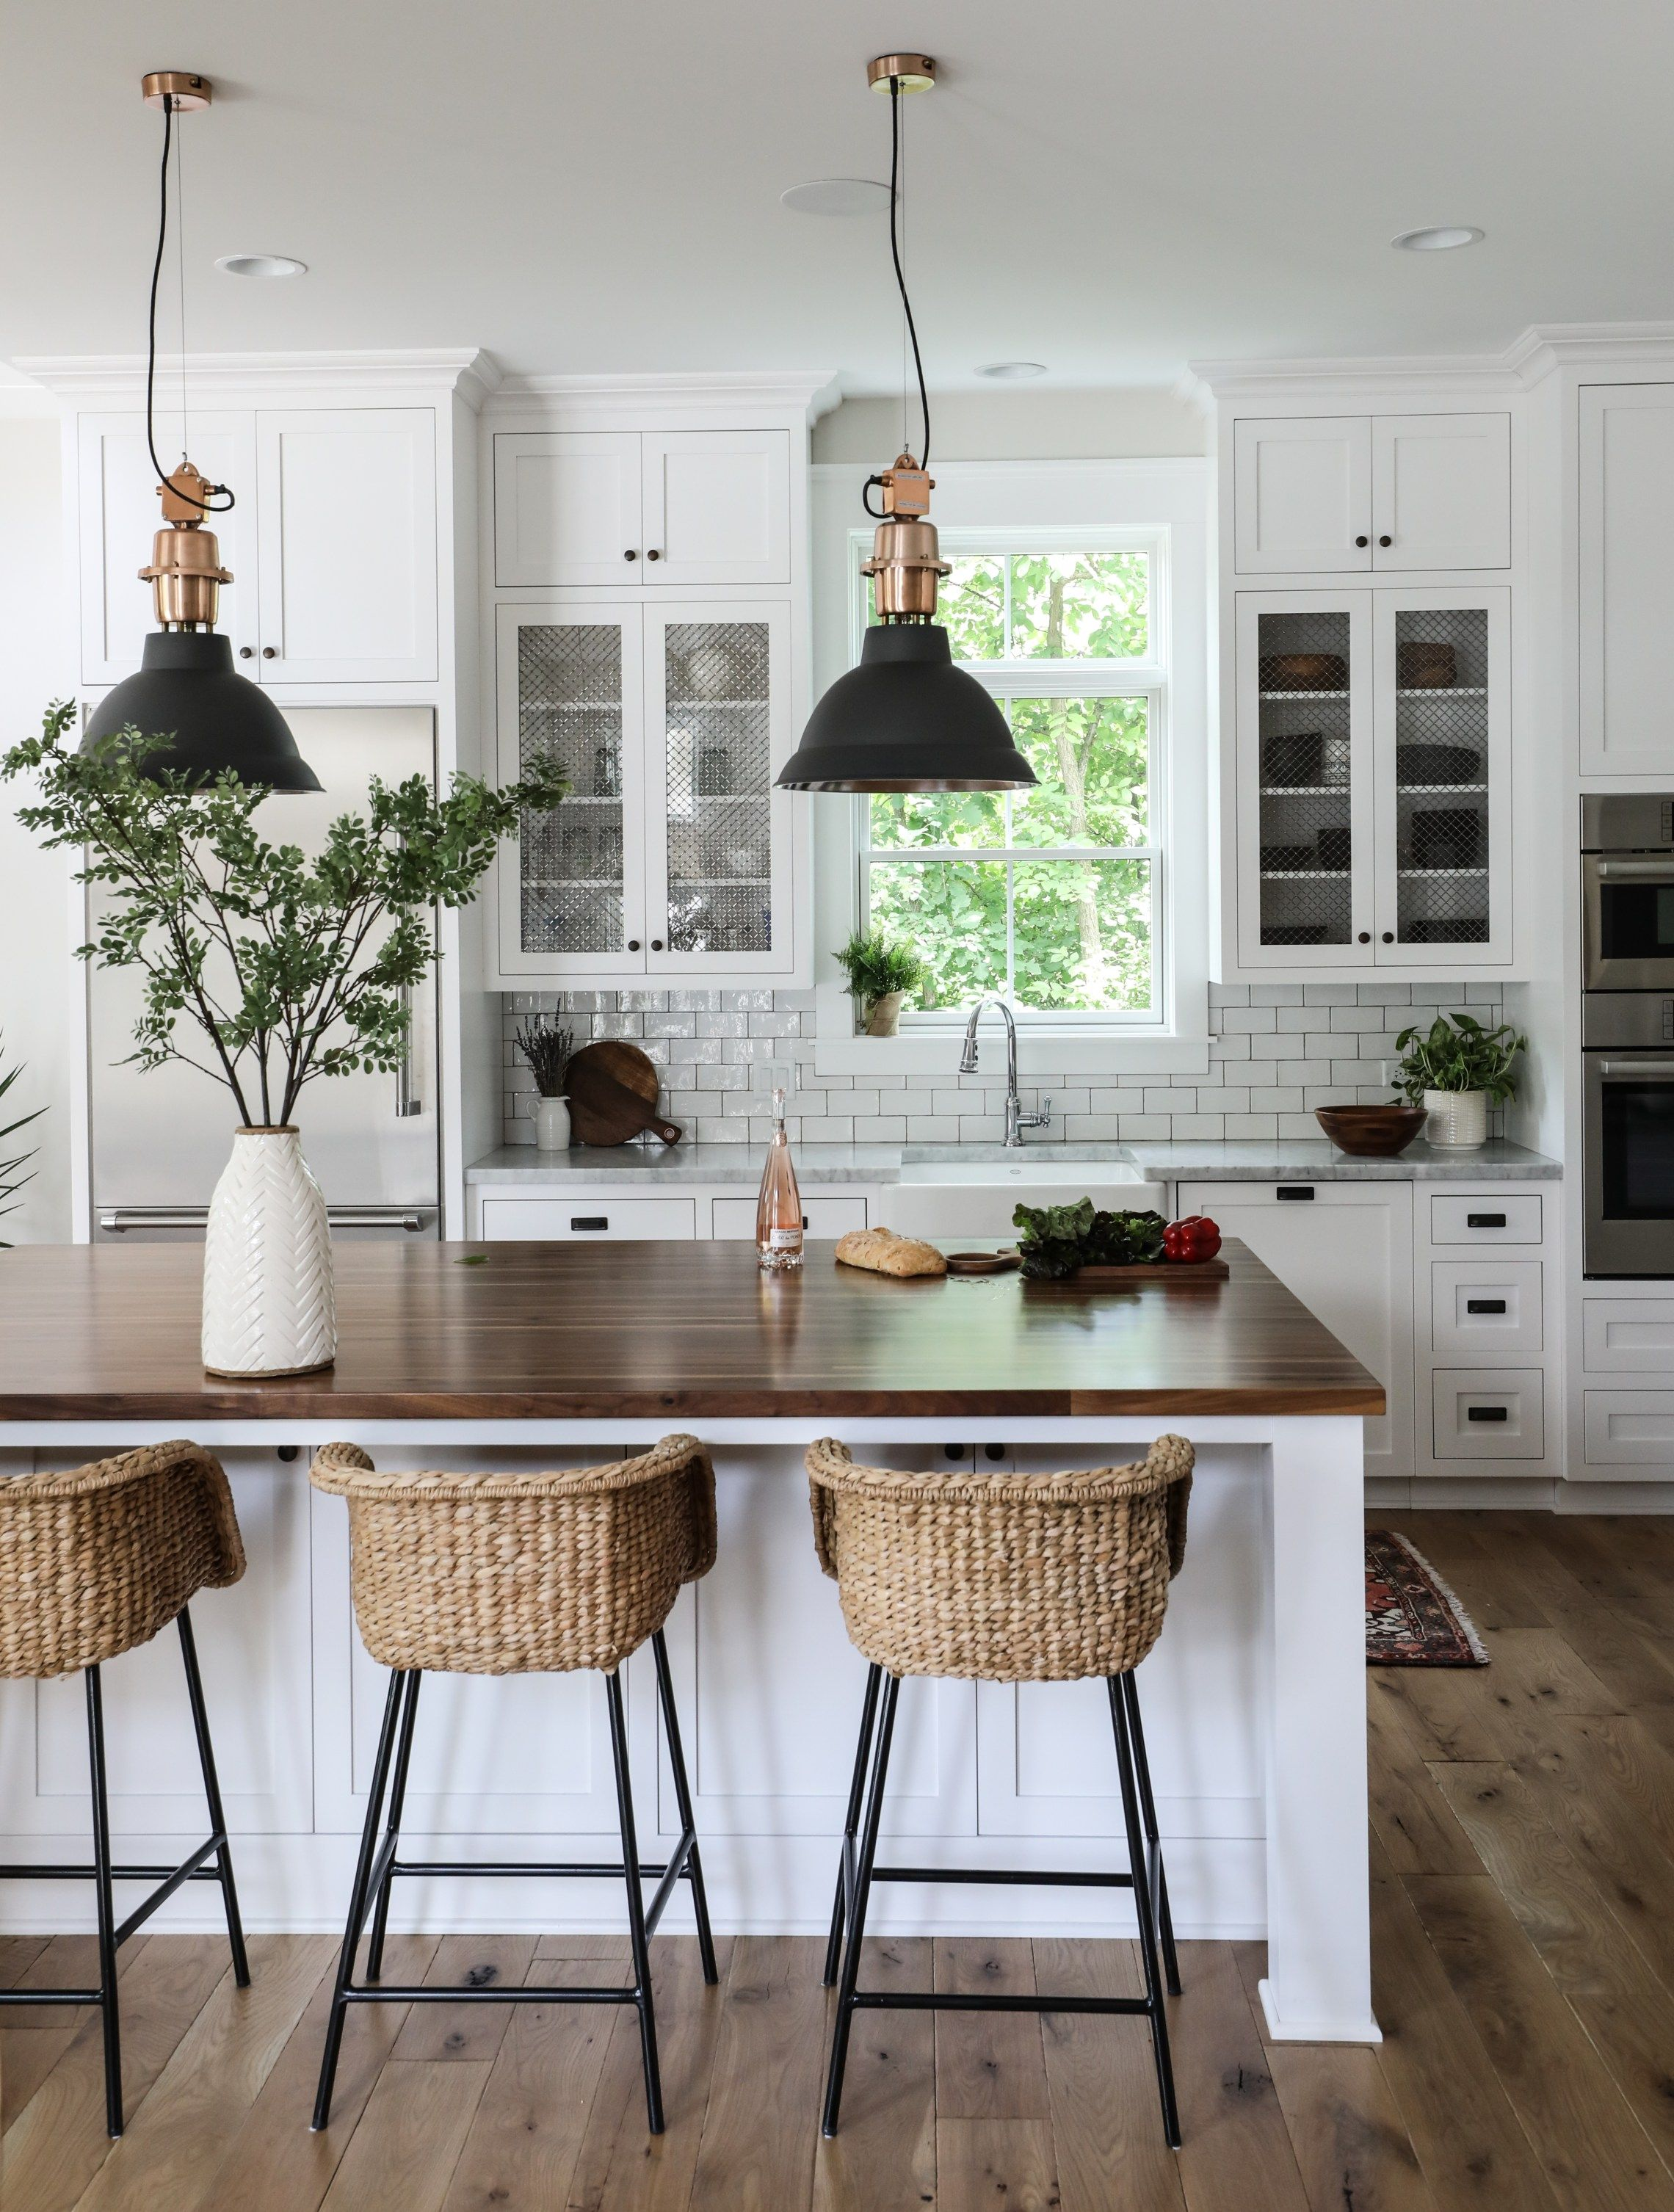 Park and Oak | Kitchens in 2019 | Home decor kitchen, Modern ...